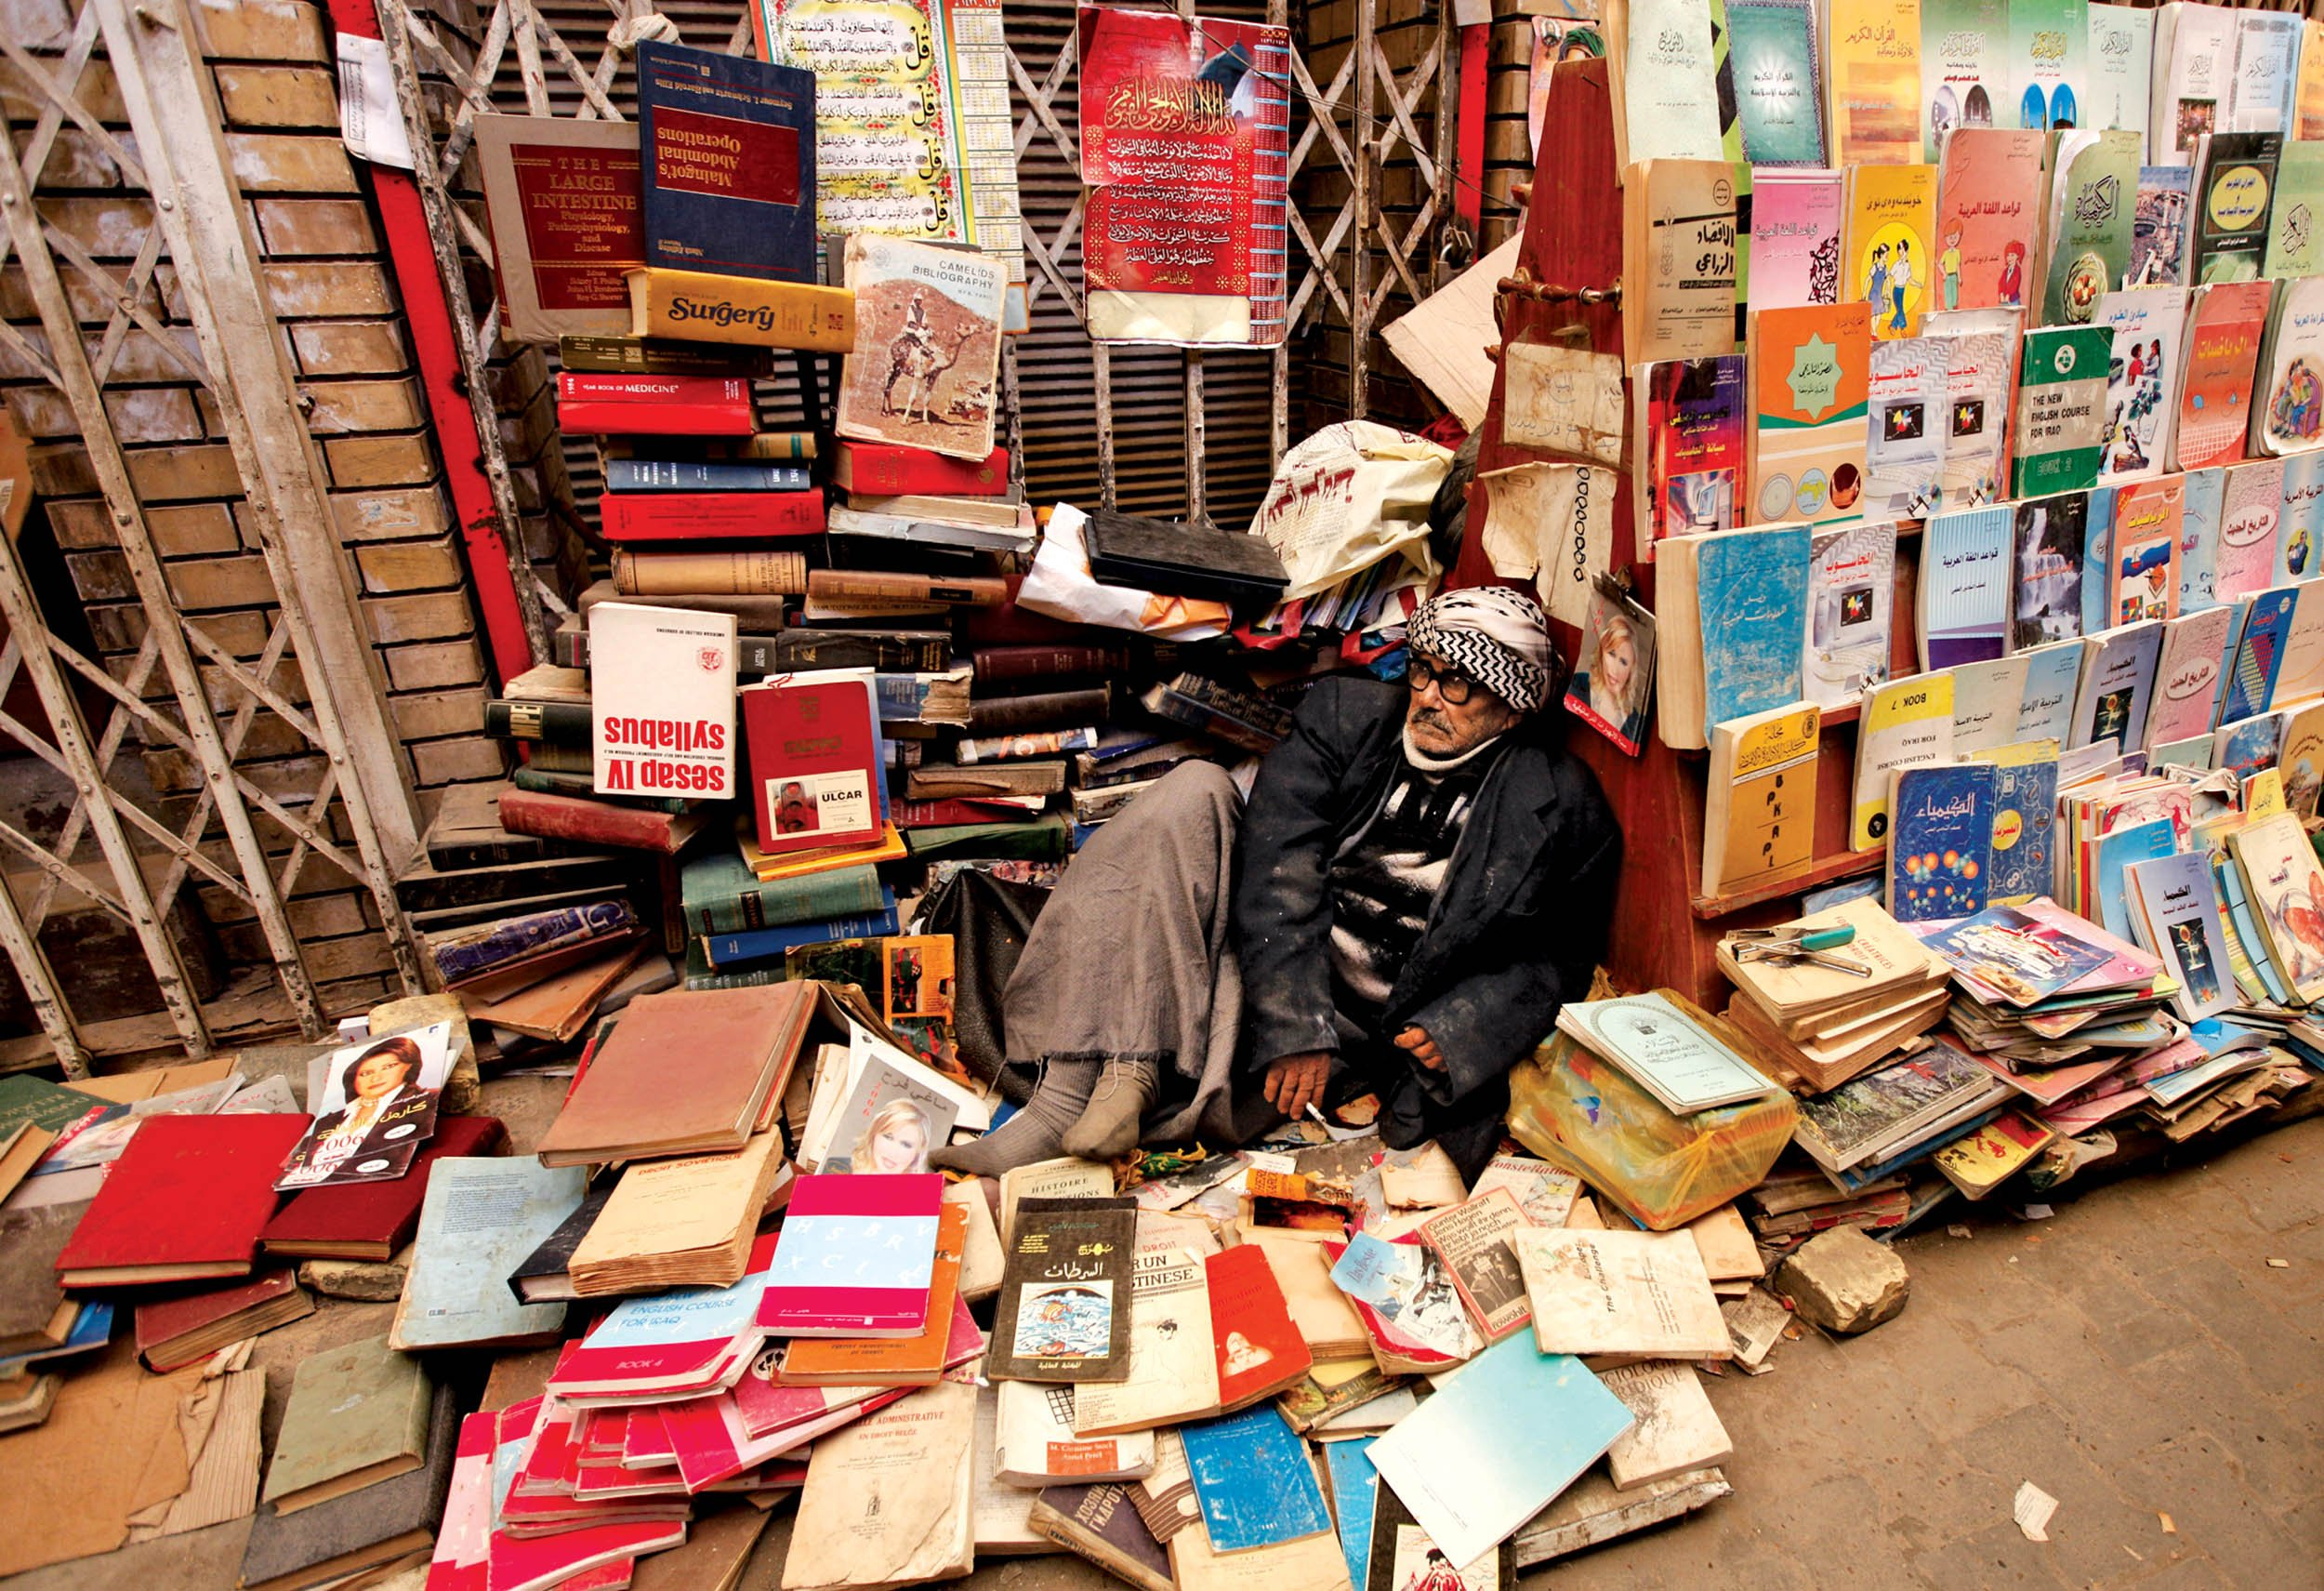 12_26_LiteraryBaghdad_02